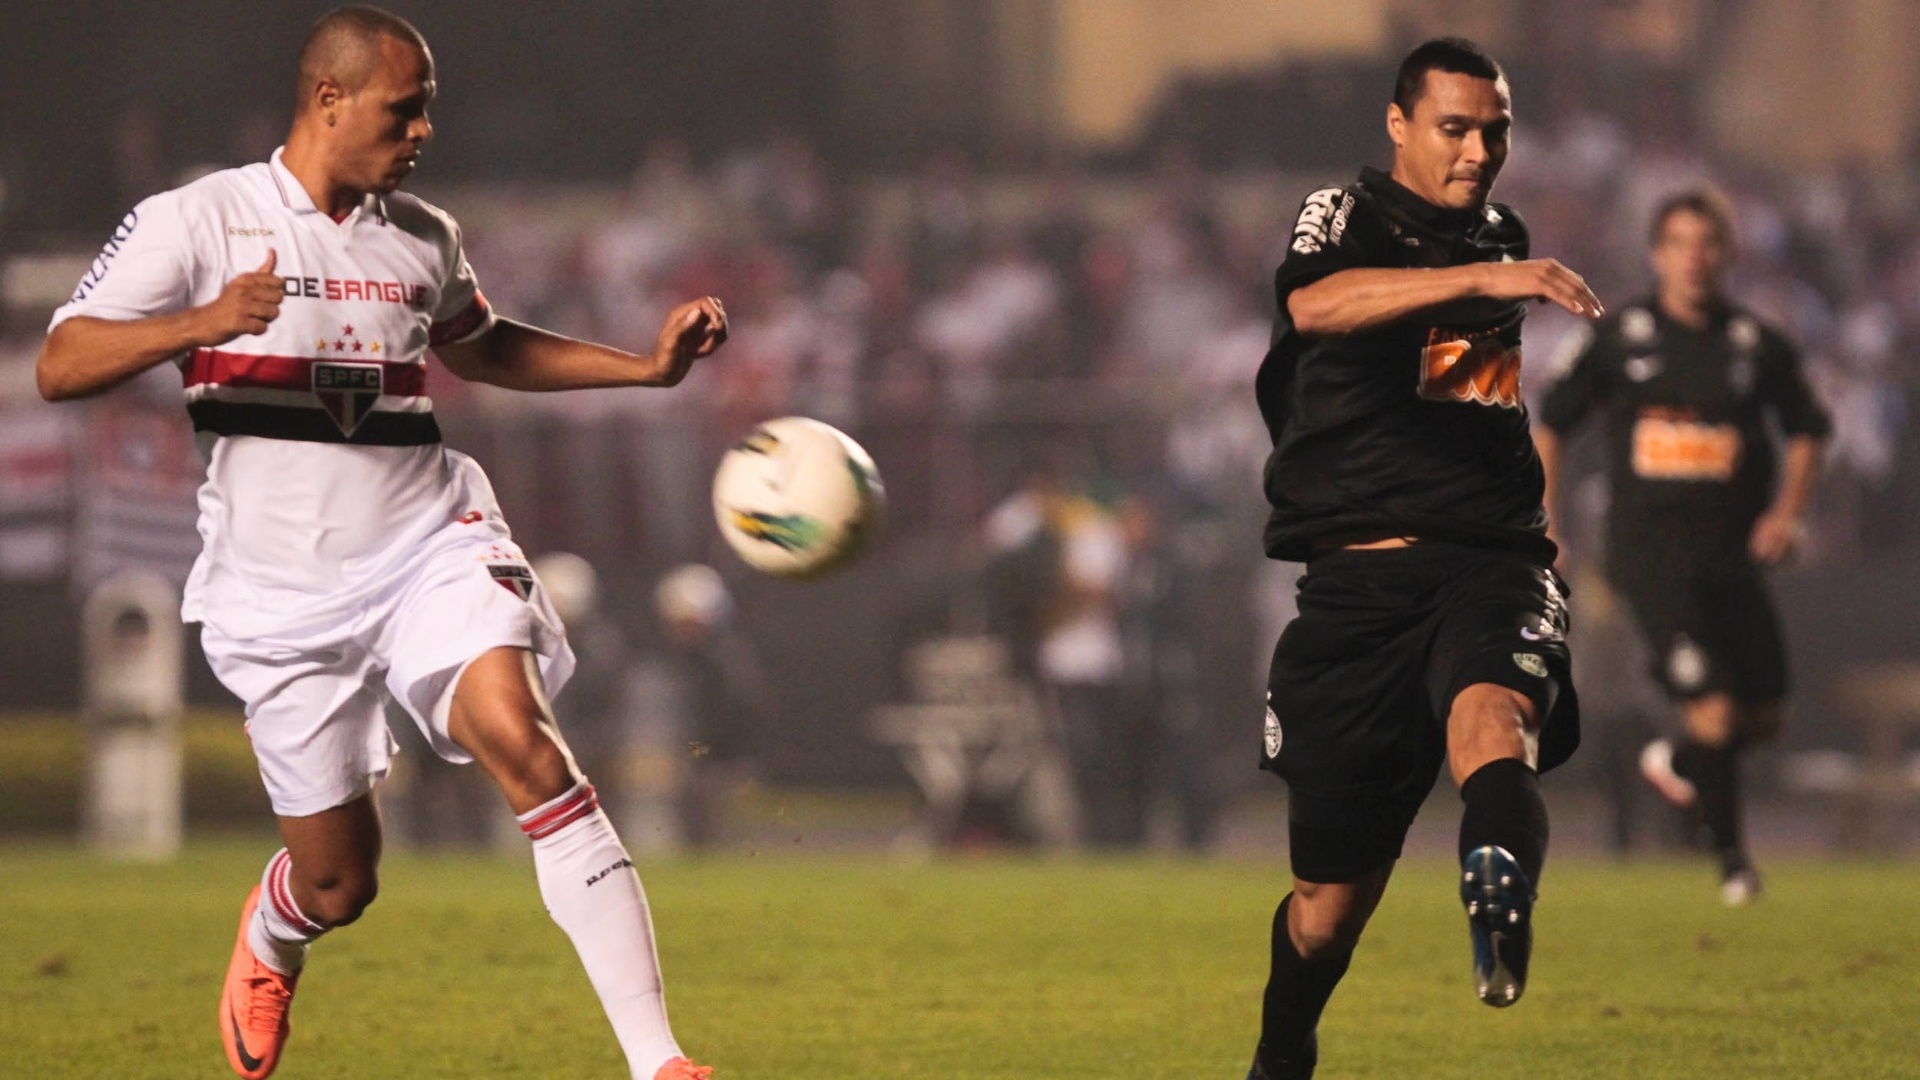 Luis Fabiano é interceptado pelo marcador do Coritiba durante jogo da Copa do Brasil